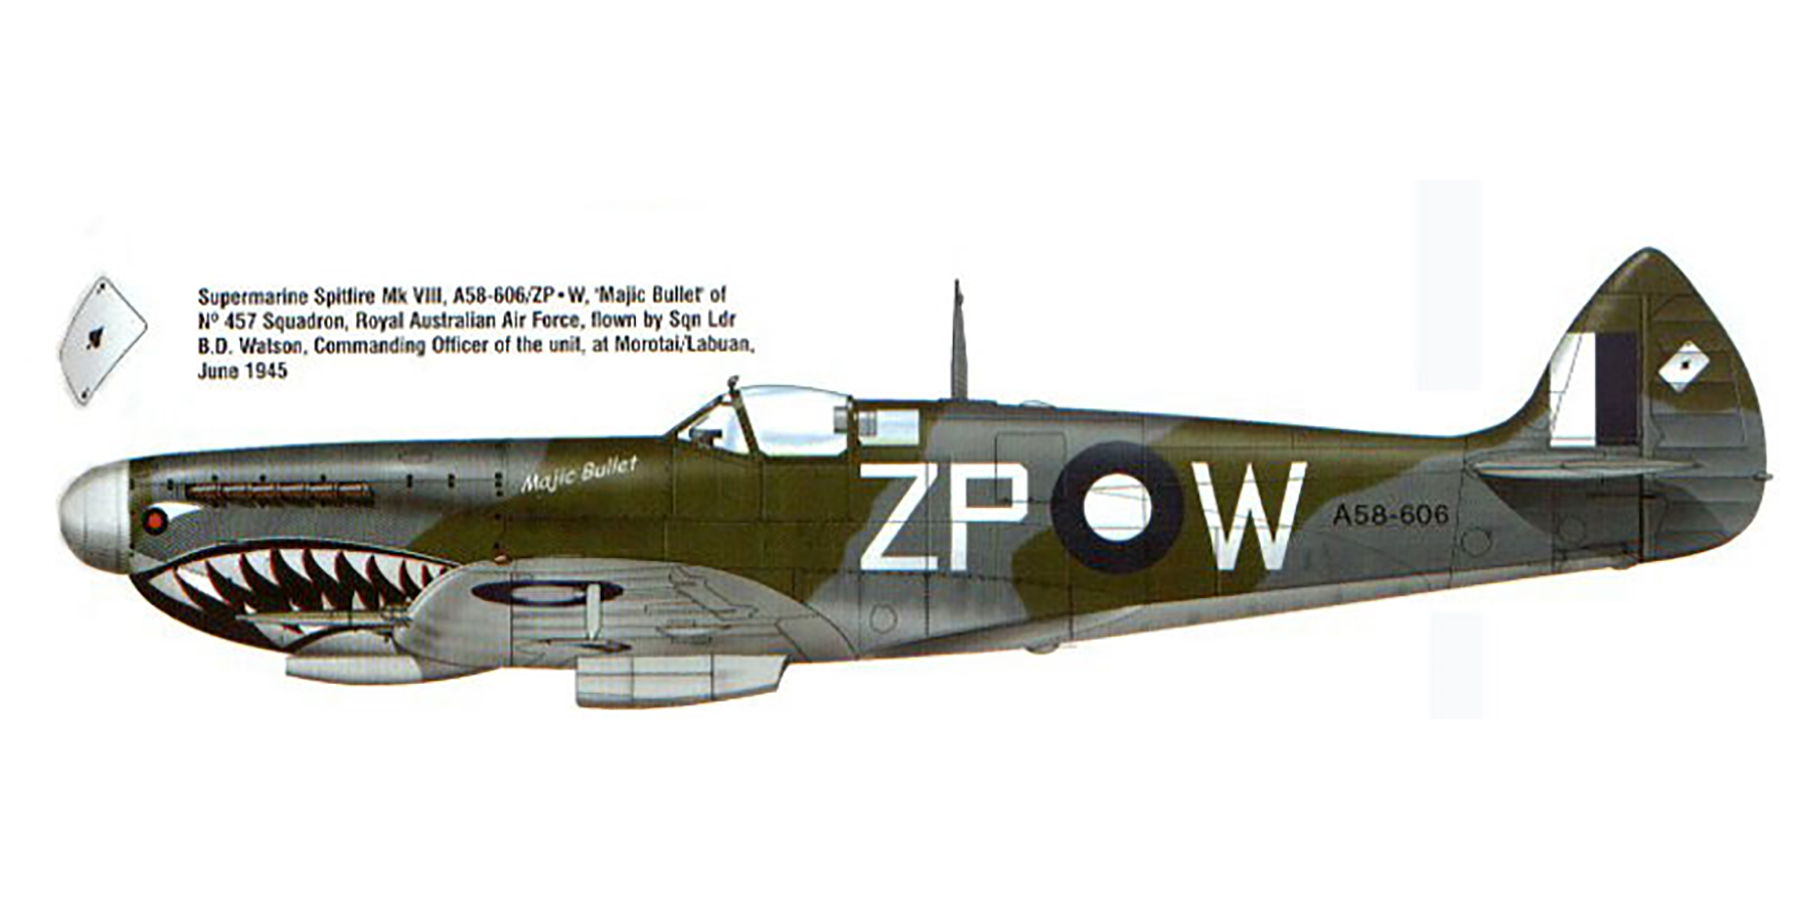 Spitfire LFVIII RAAF 457Sqn ZPW A58 606 BD Watson Morotai 1945 0A